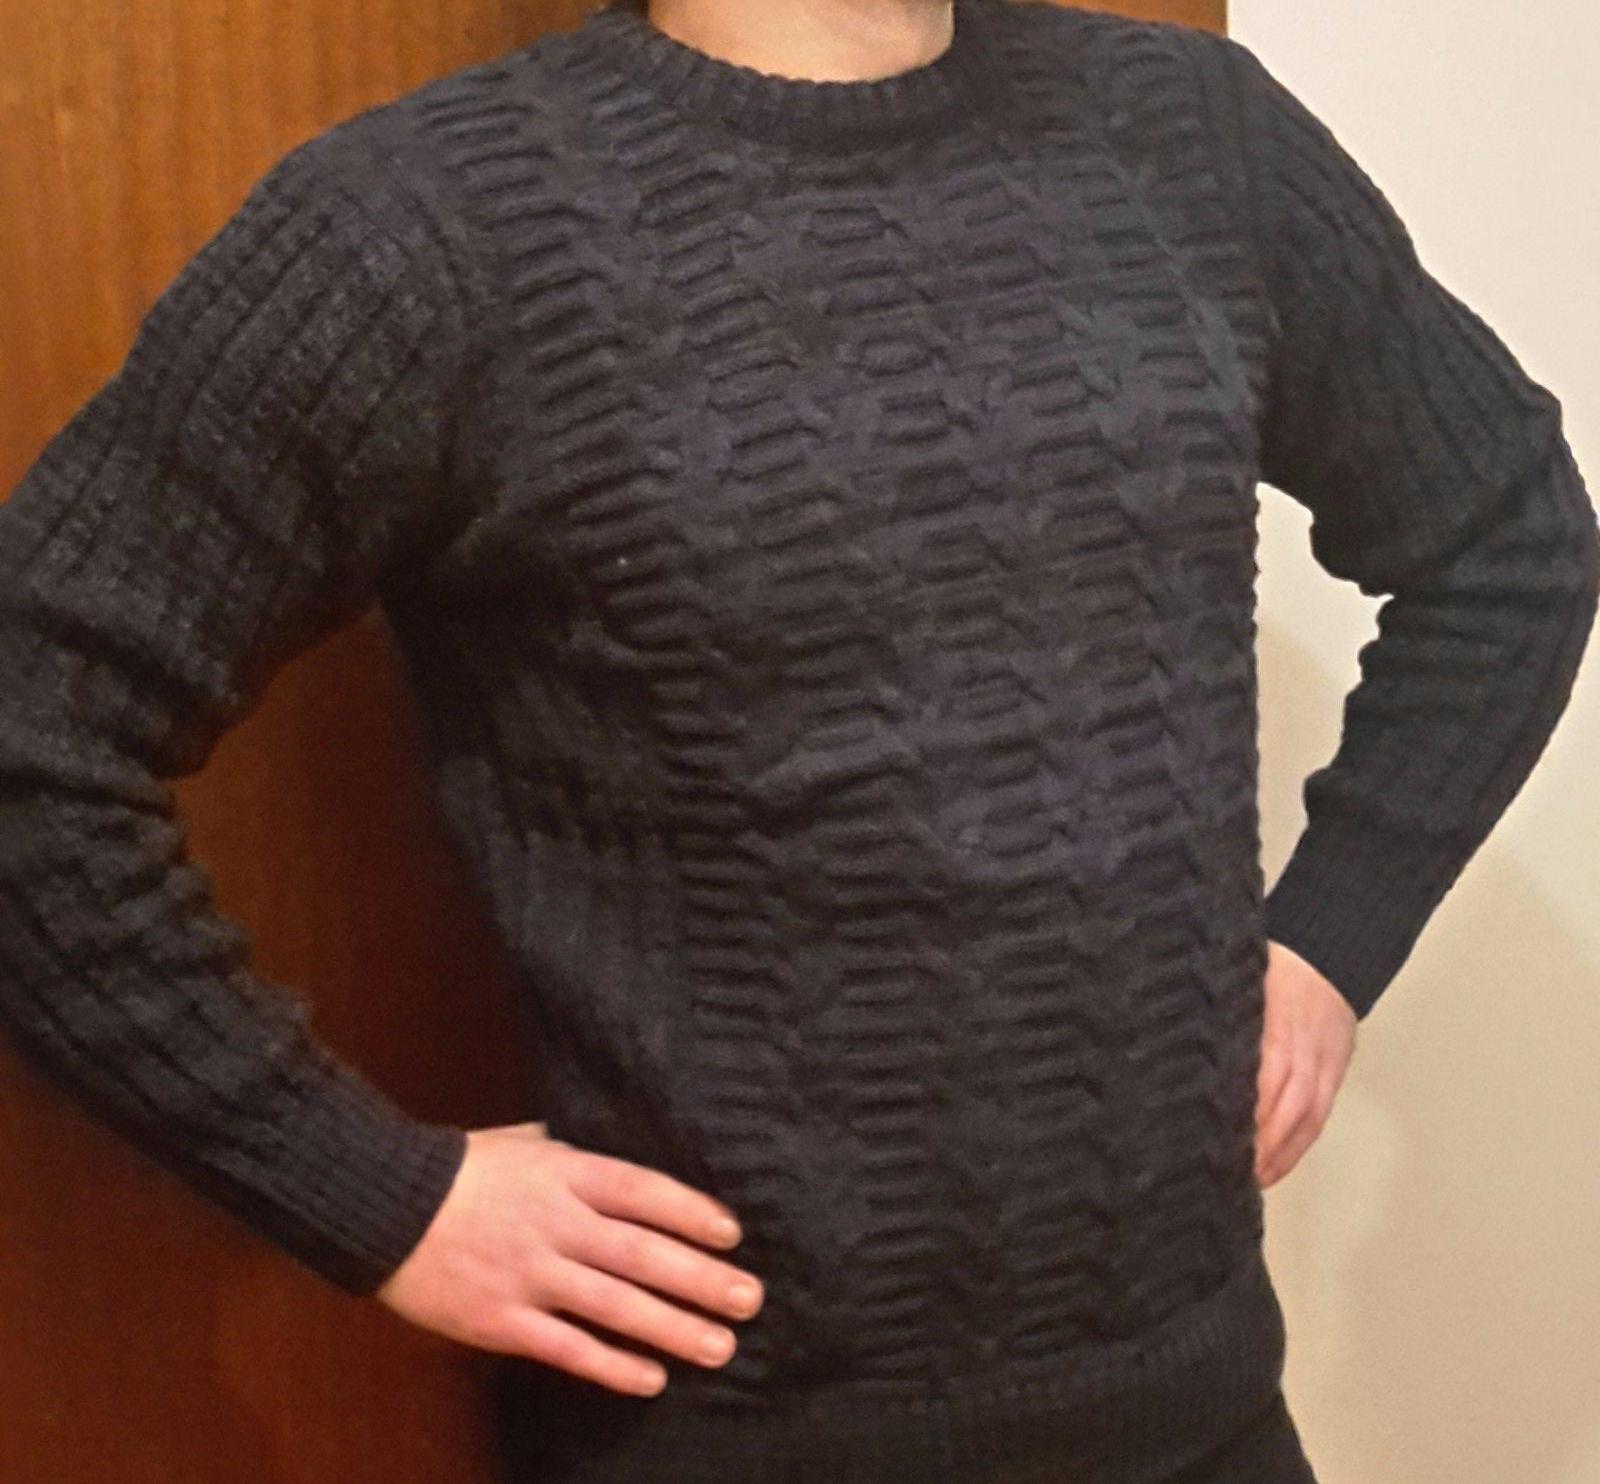 c1aff30daed3 Pánsky pletený sveter